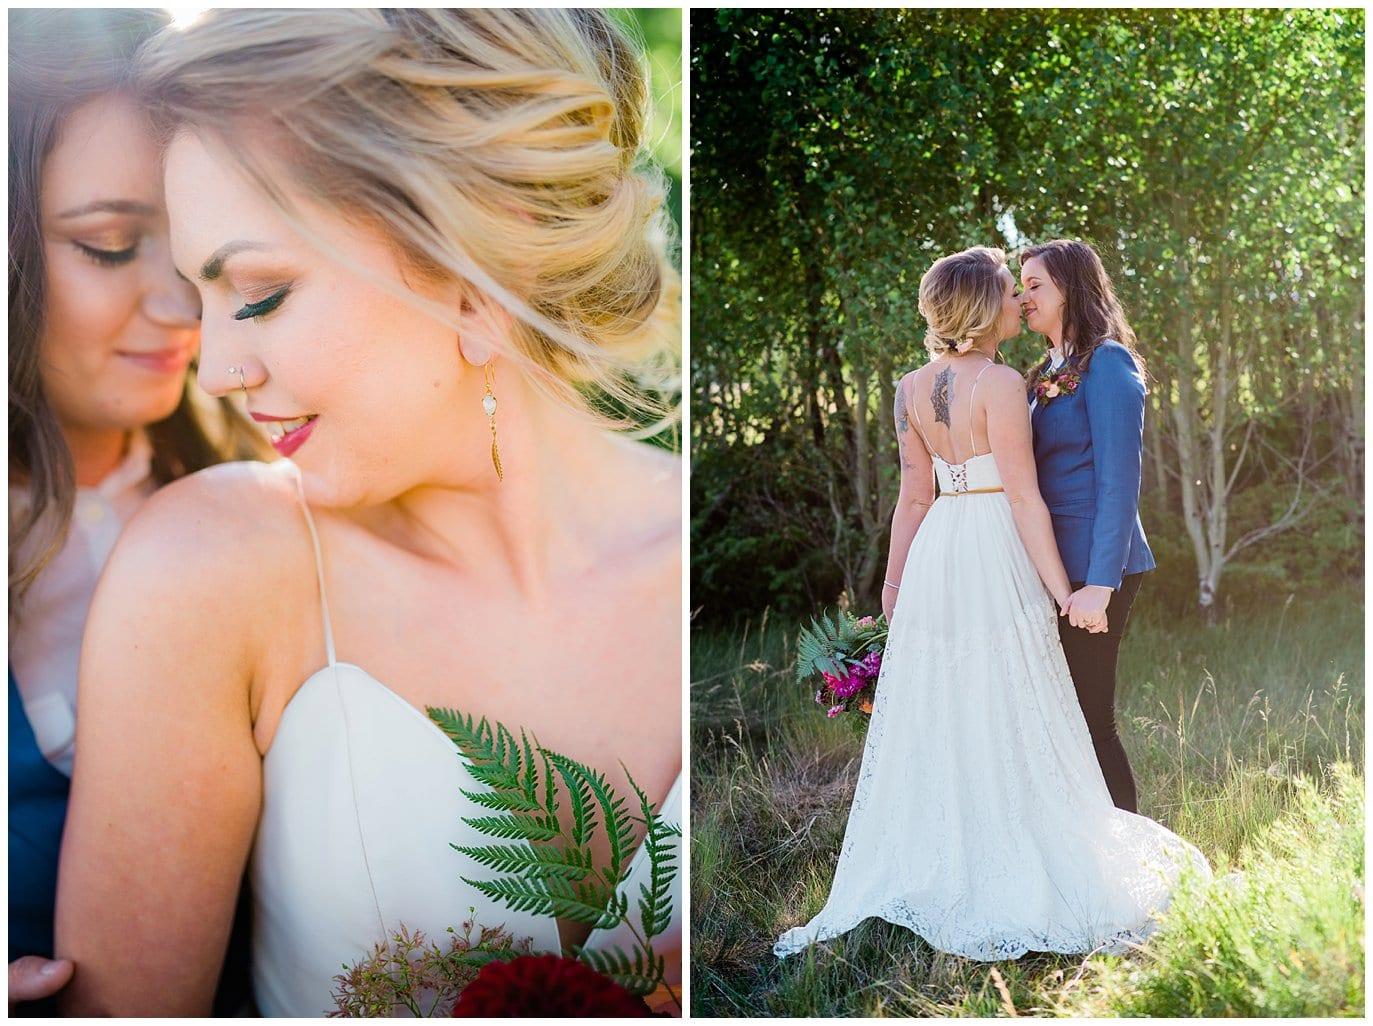 intimate same-sex wedding photo